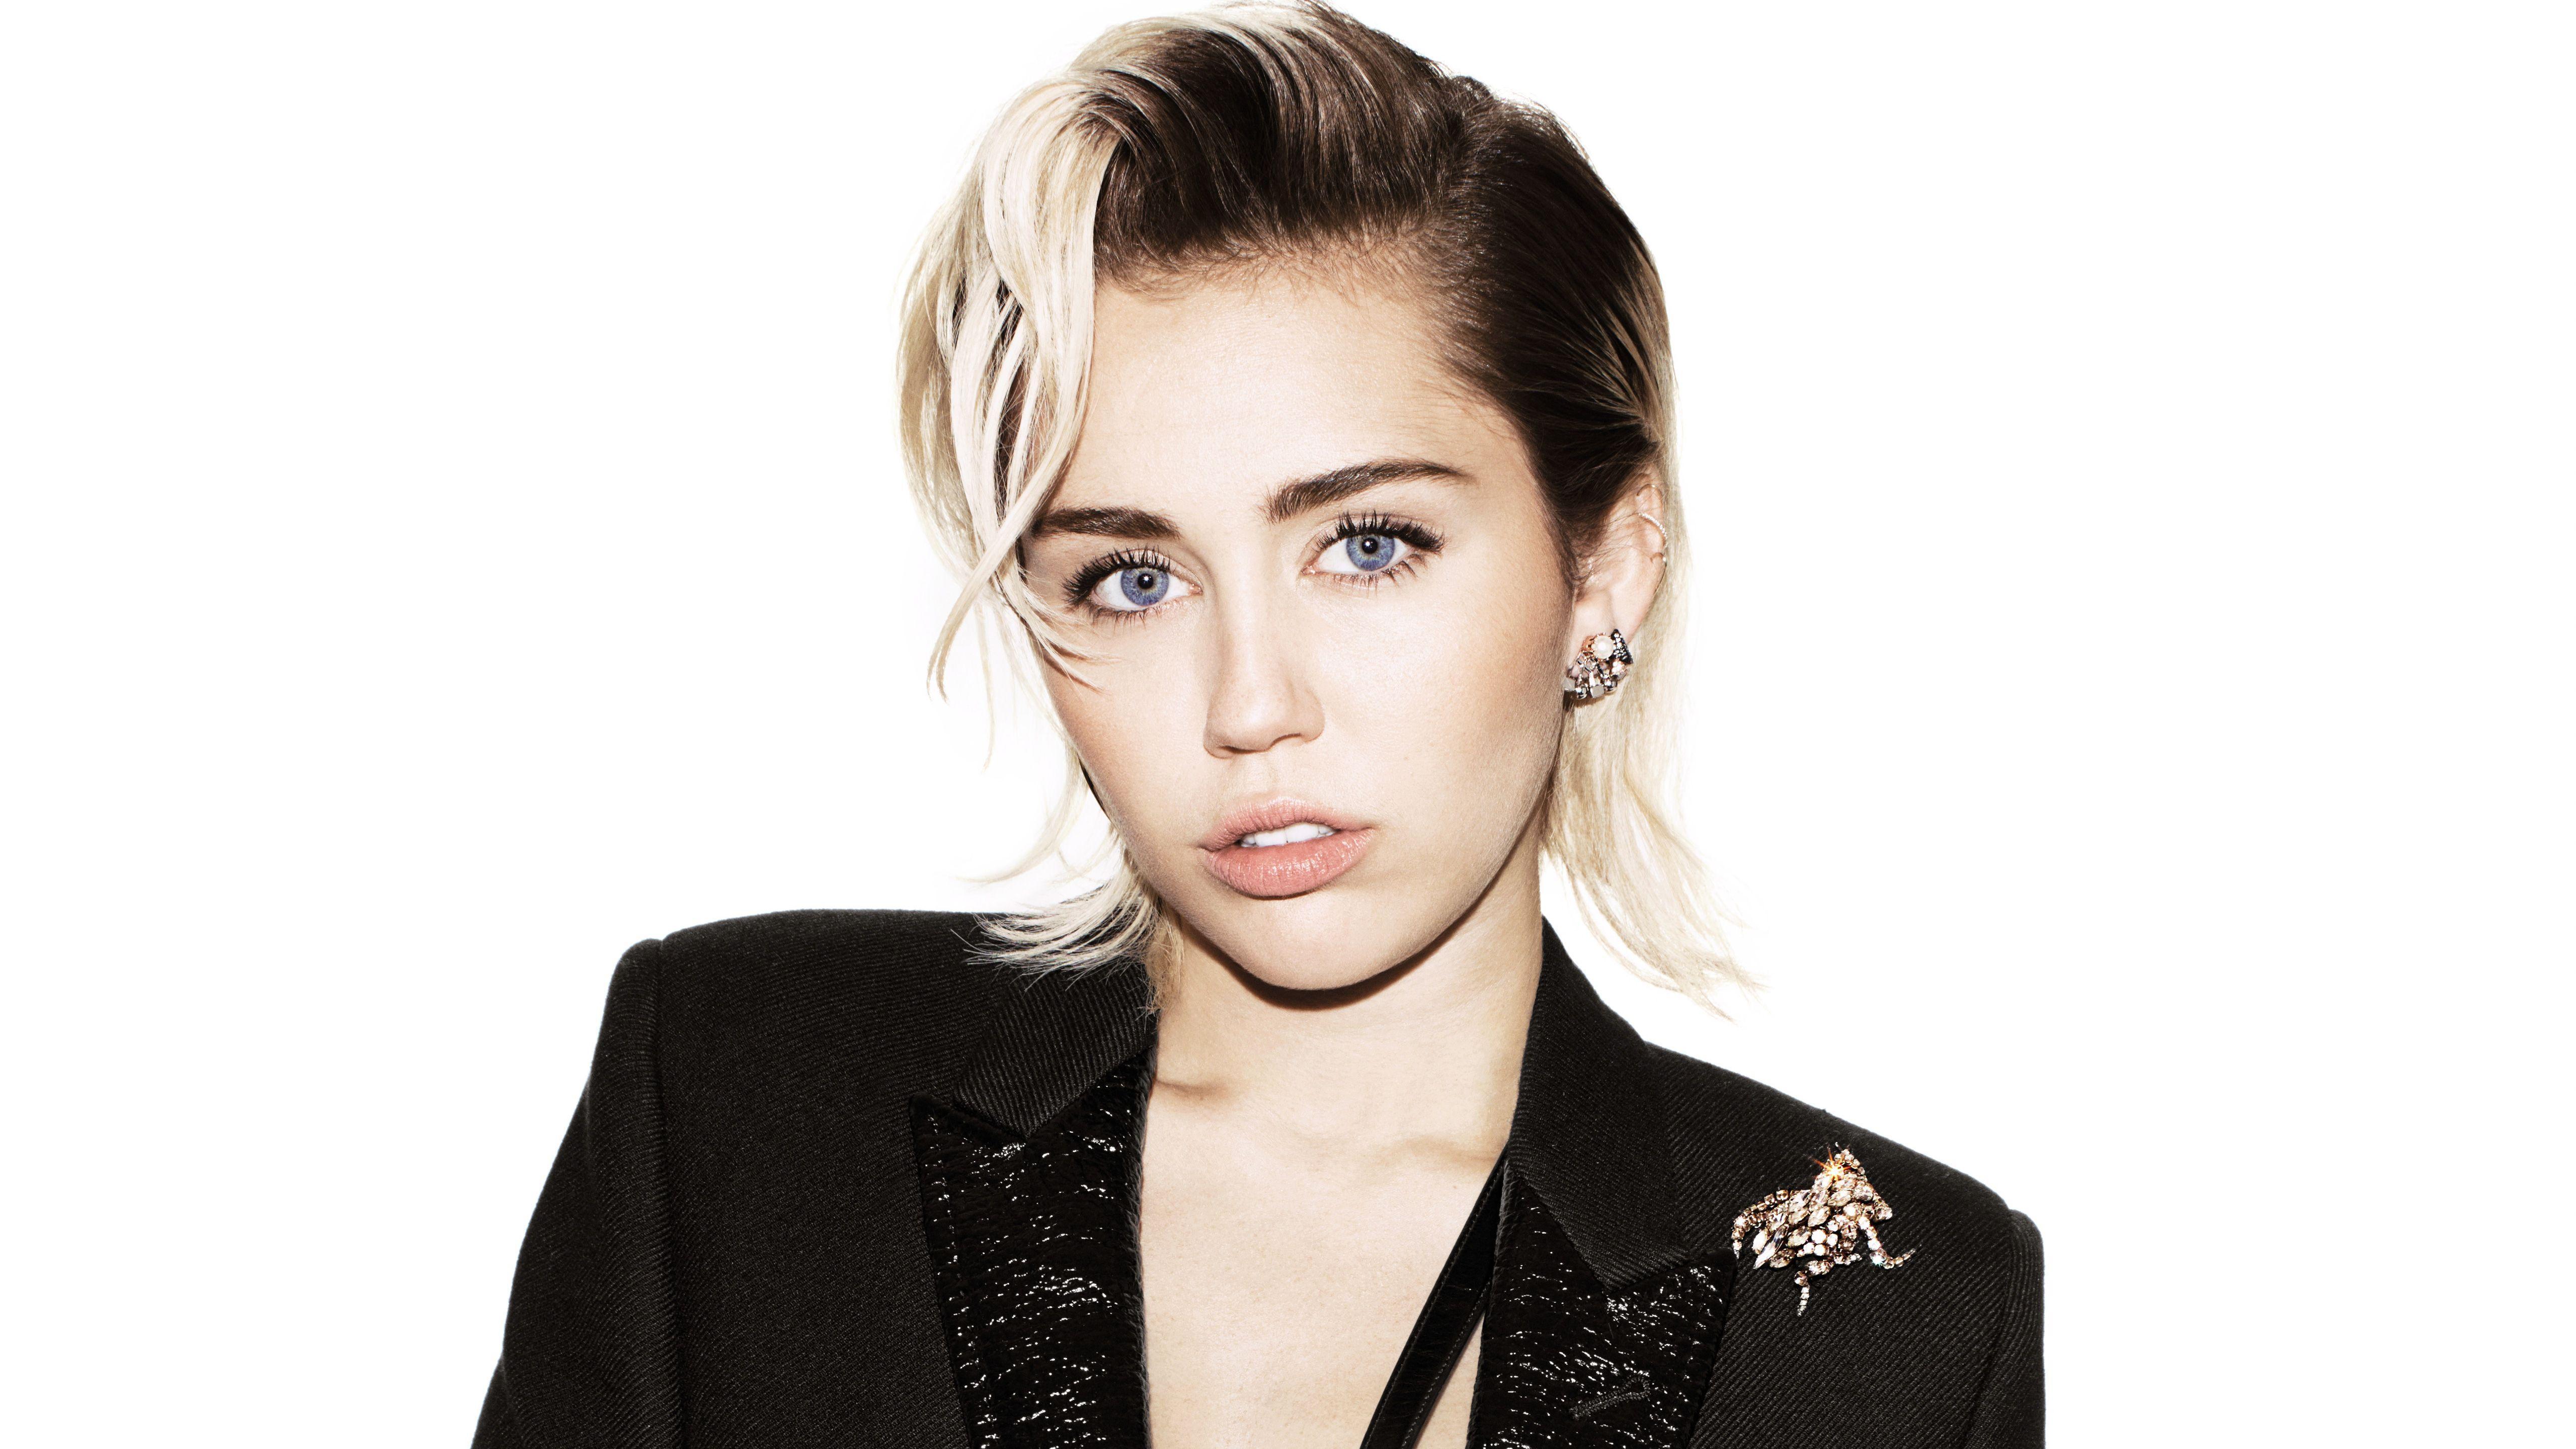 Miley Cyrus Hd Wallpapers Wallpaper Cave